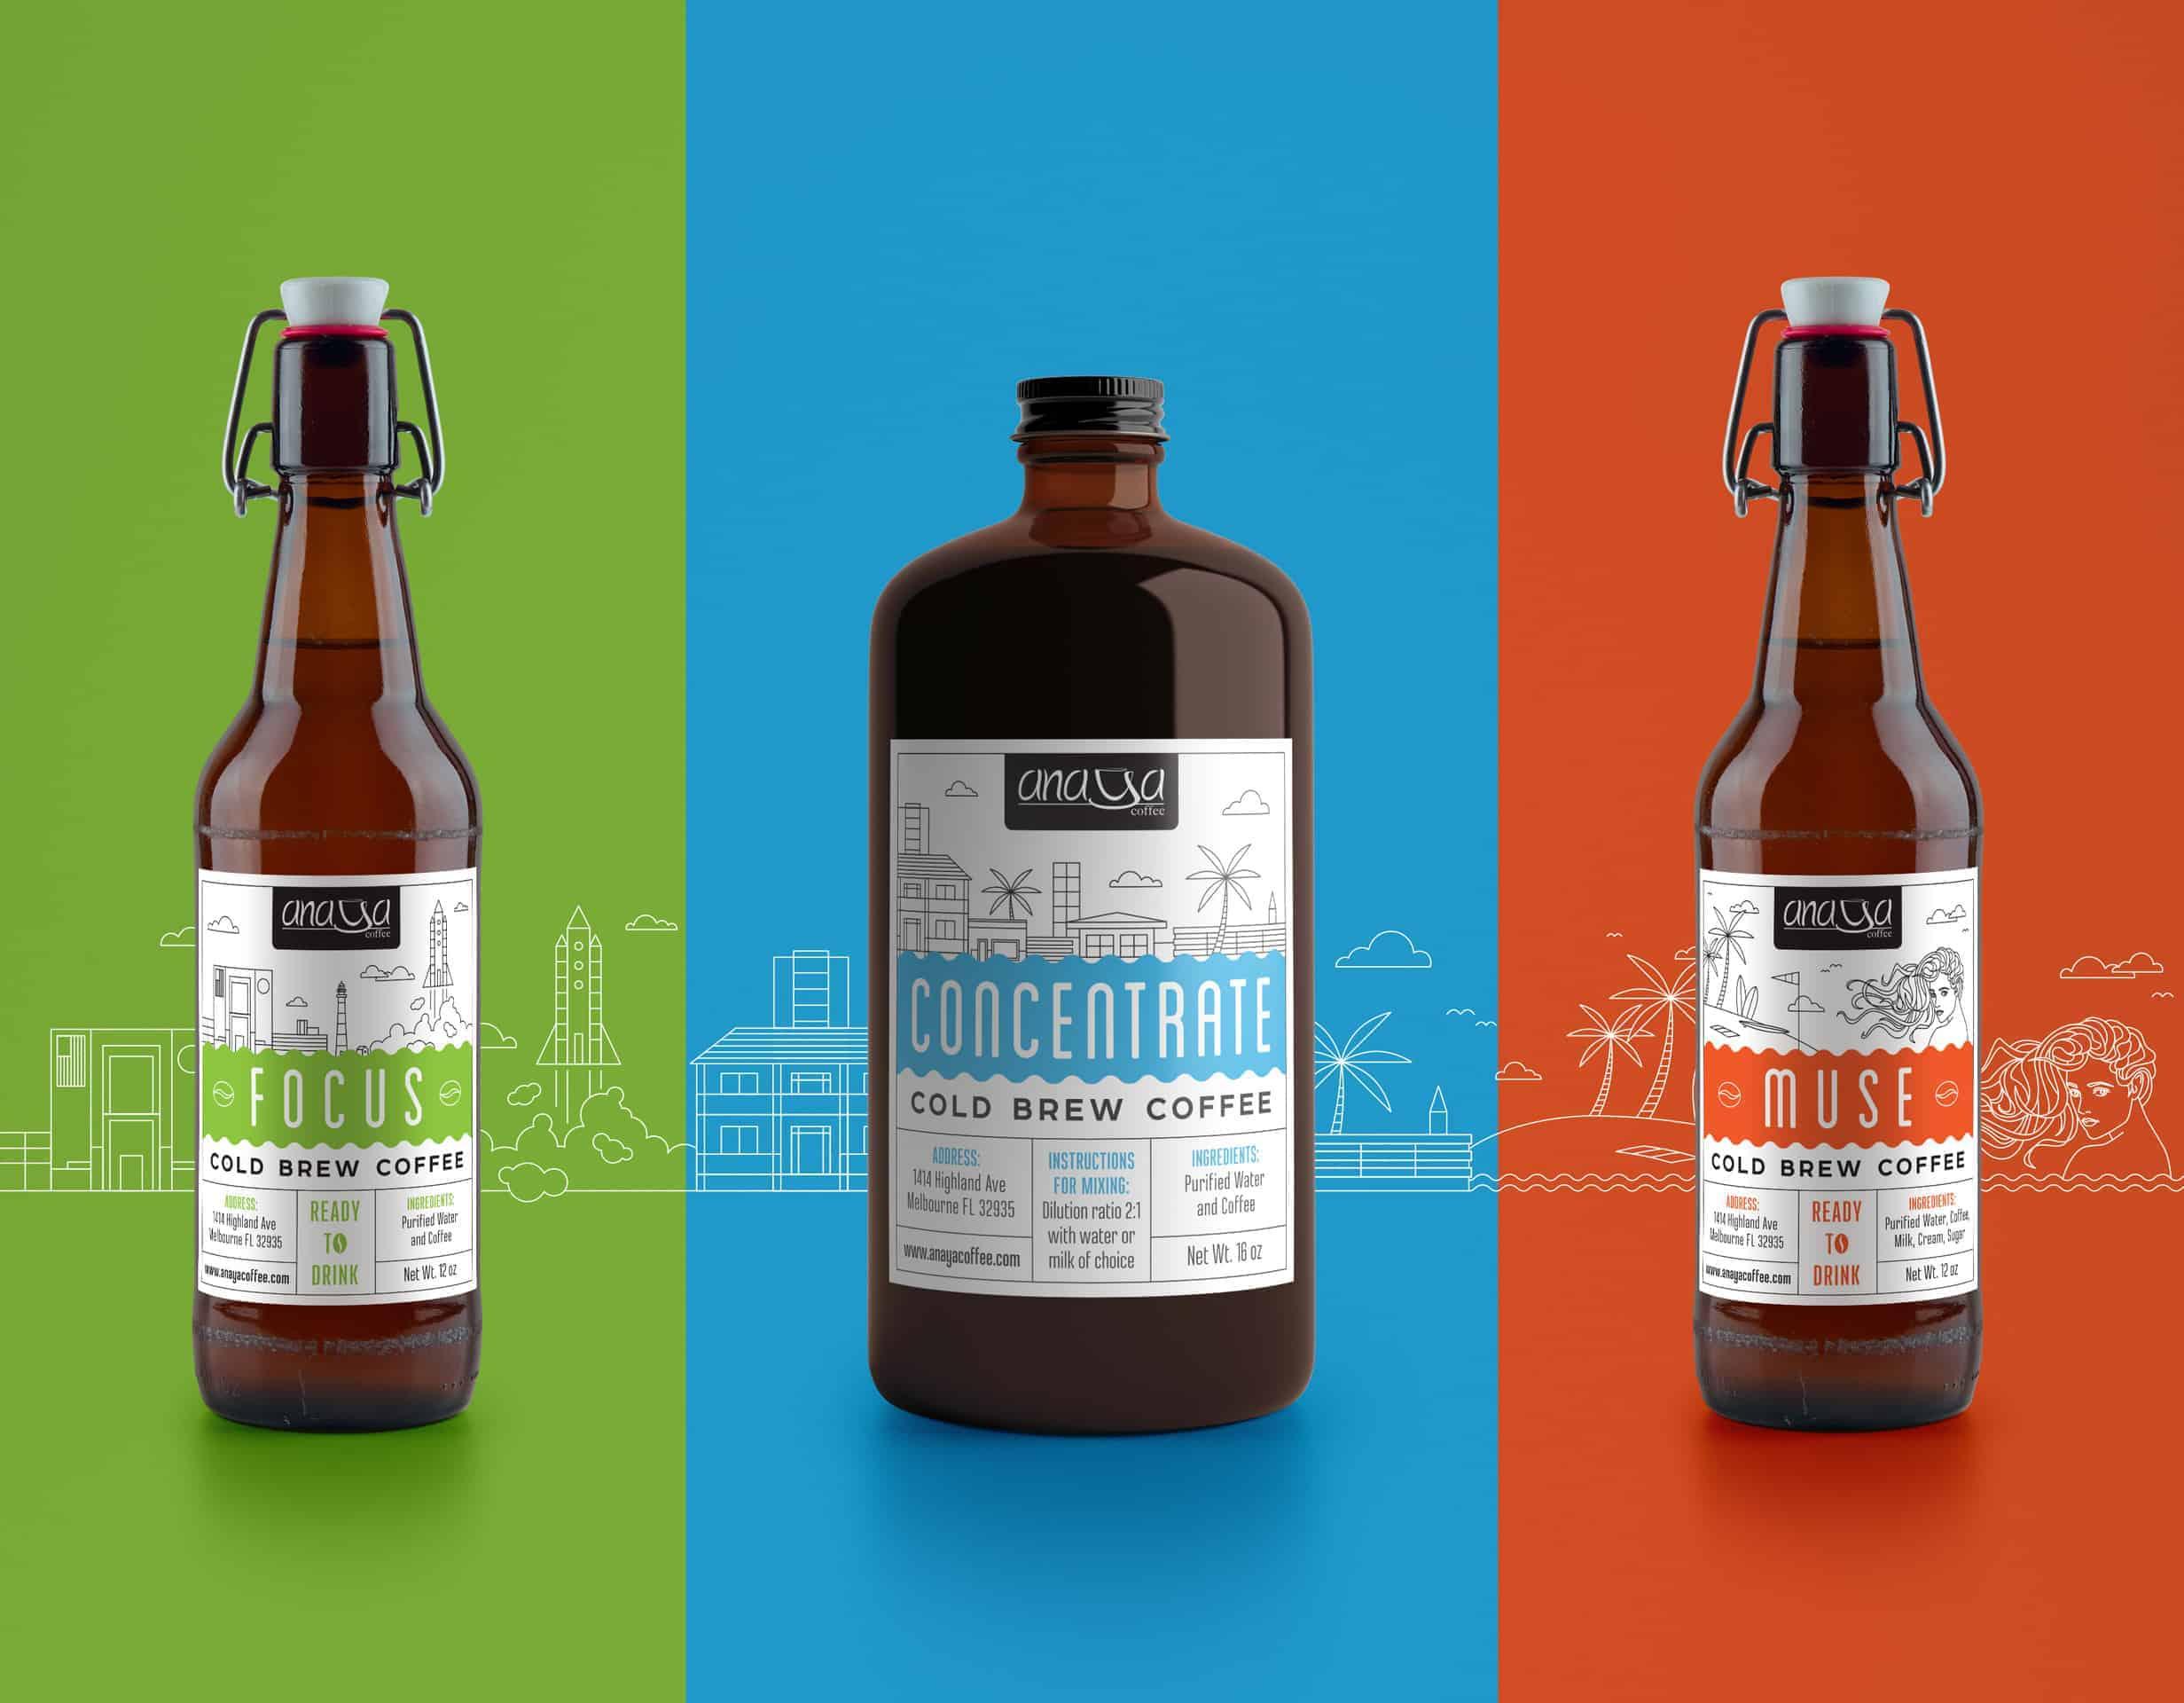 Anaya Coffee Cold Brew Labels by Ludmila Katagarova - Design ...